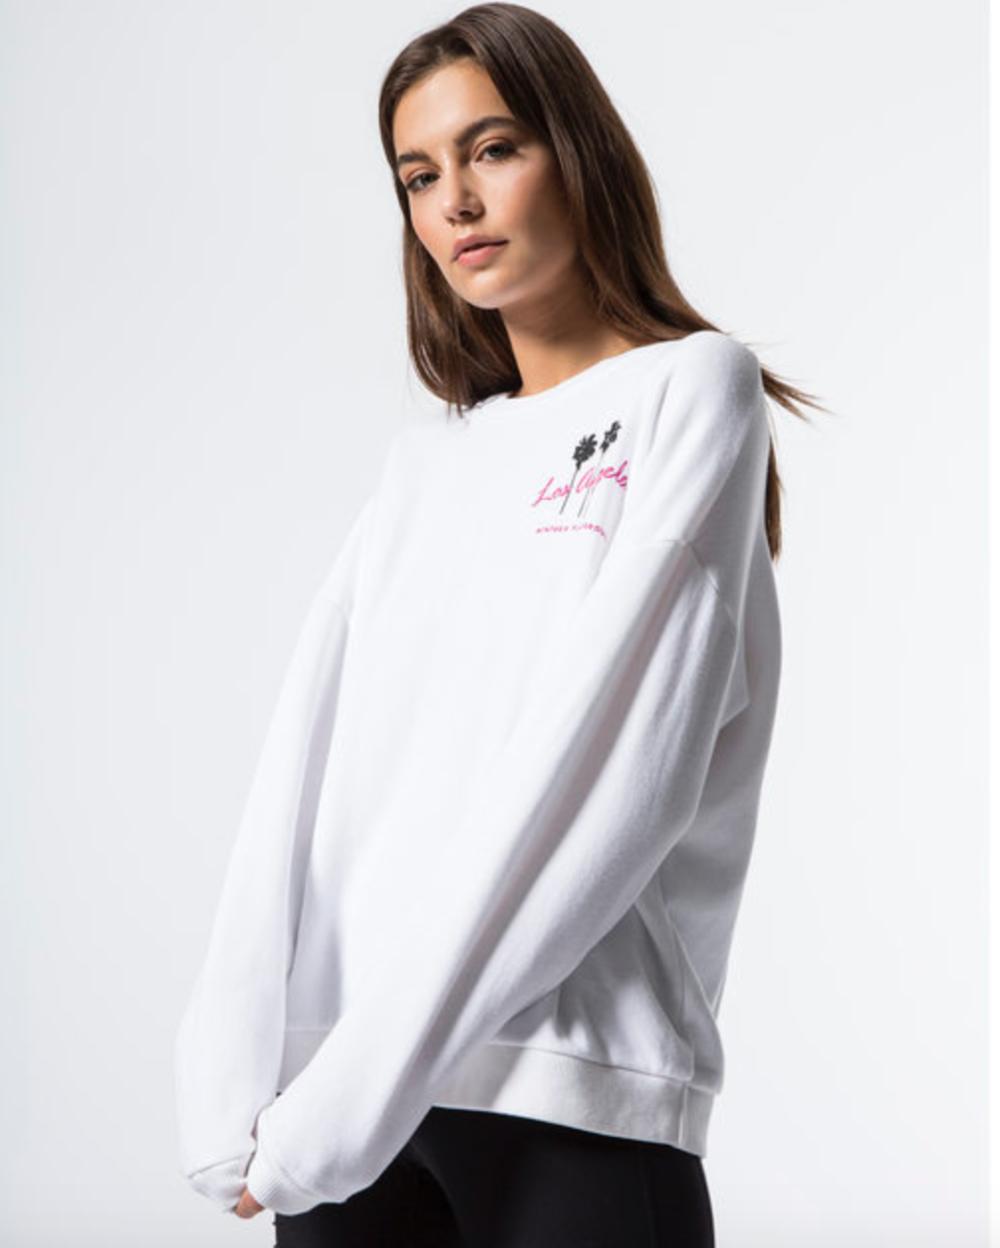 Winter's Playground Sweatshirt in White from LNA, $110  Photo Credit:  Carbon 38